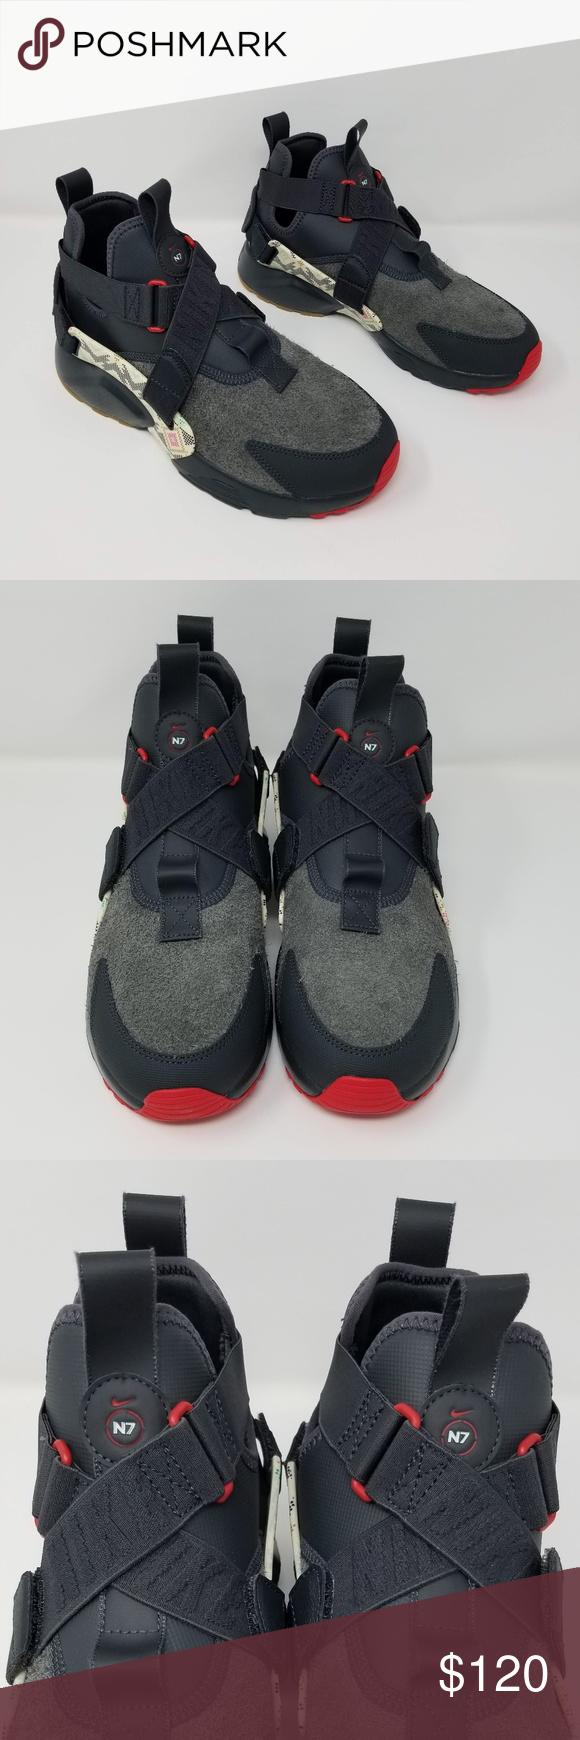 best sneakers df1d9 44bea Nike AIR HUARACHE CITY UTILITY PREMIUM N7 Nike AIR HUARACHE CITY UTILITY  PREMIUM N7 AT6170 001